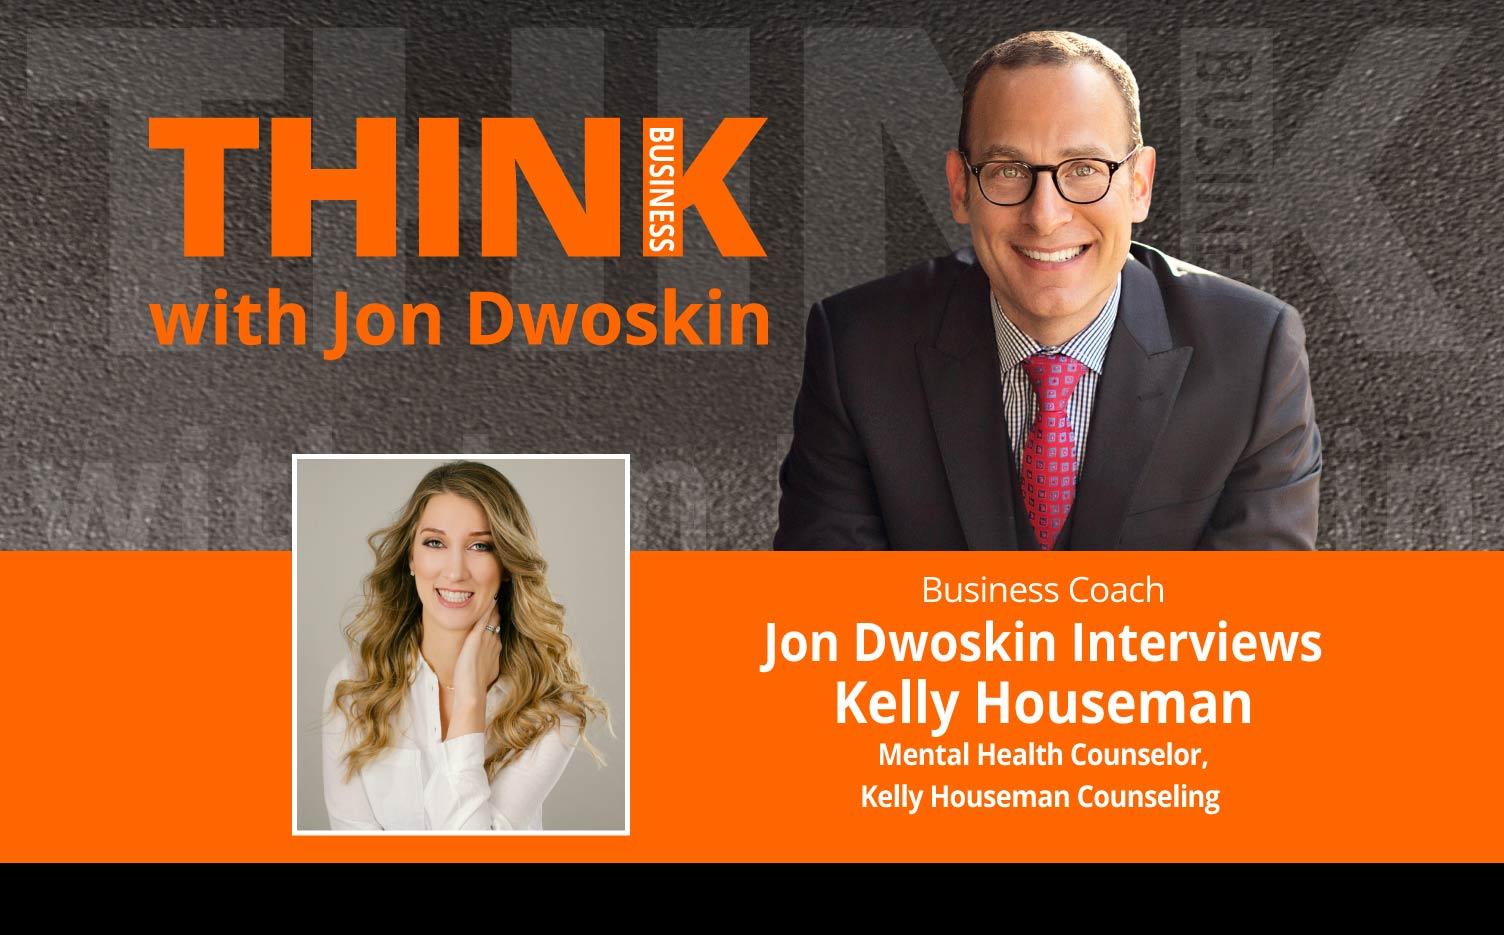 THINK Business Podcast: Jon Dwoskin Interviews Kelly Houseman, Mental Health Counselor, Kelly Houseman Counseling